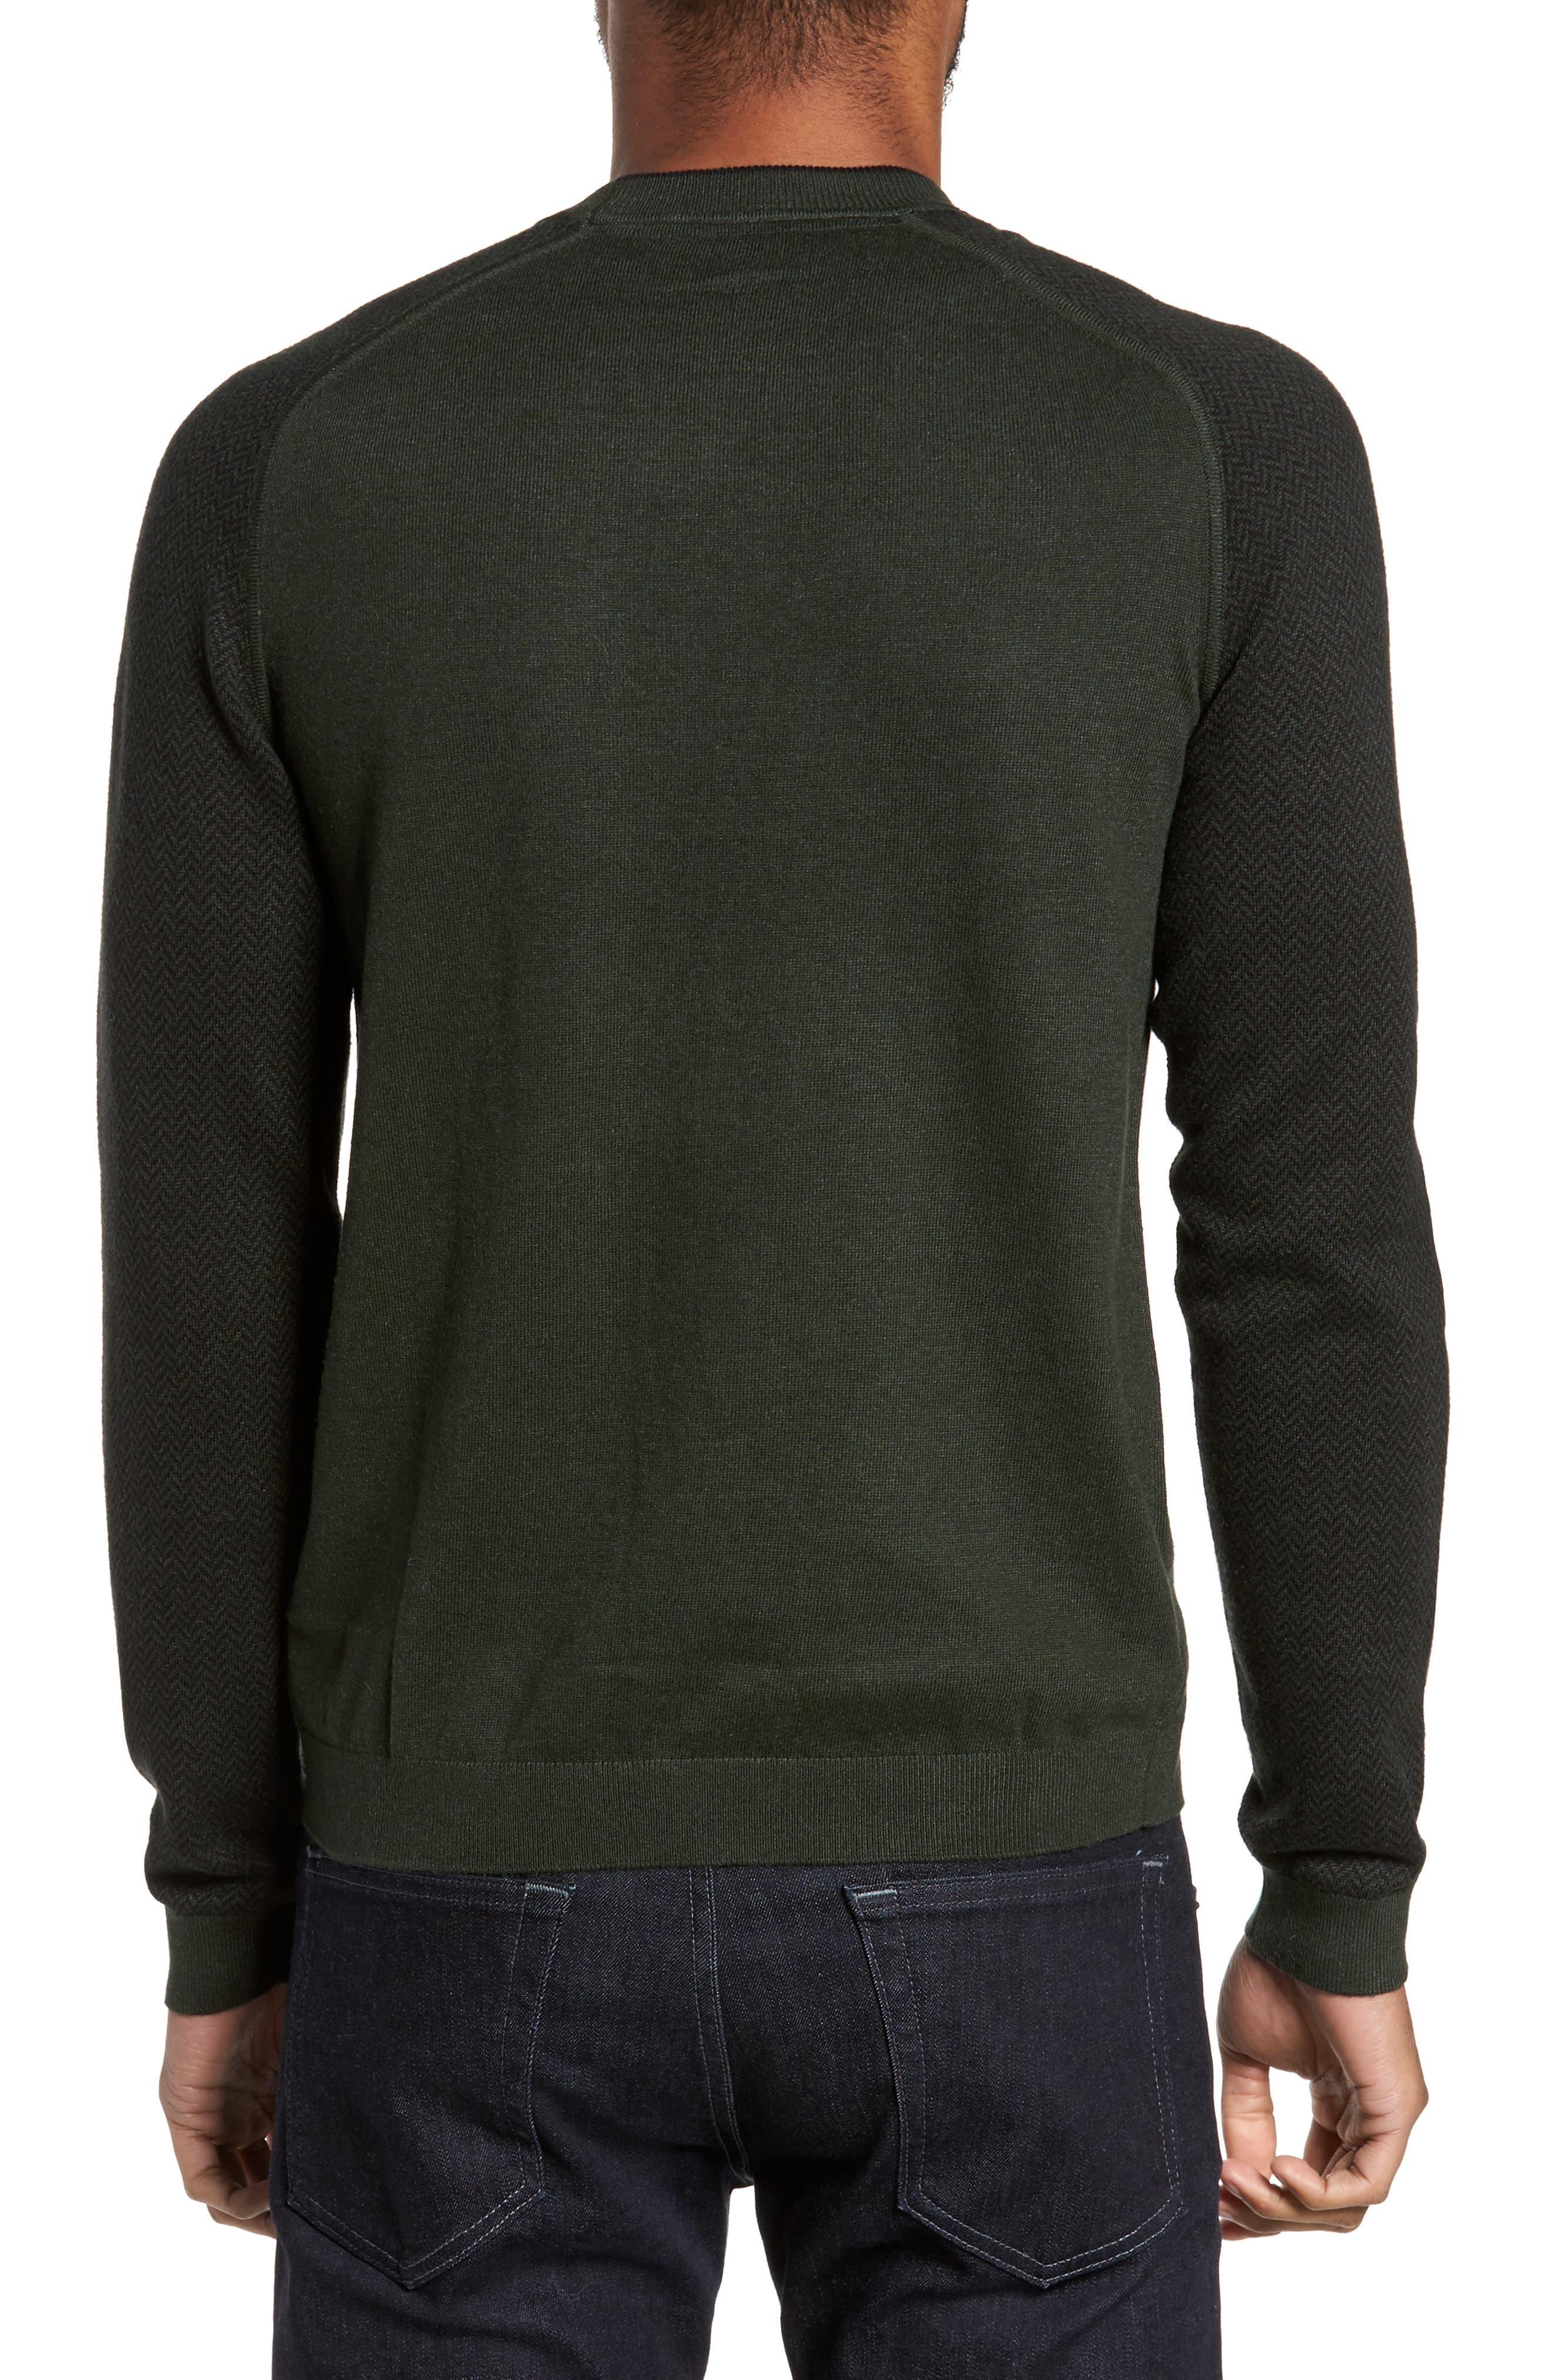 Pepmint Herringbone Sleeve Sweatshirt,                             Alternate thumbnail 2, color,                             Khaki